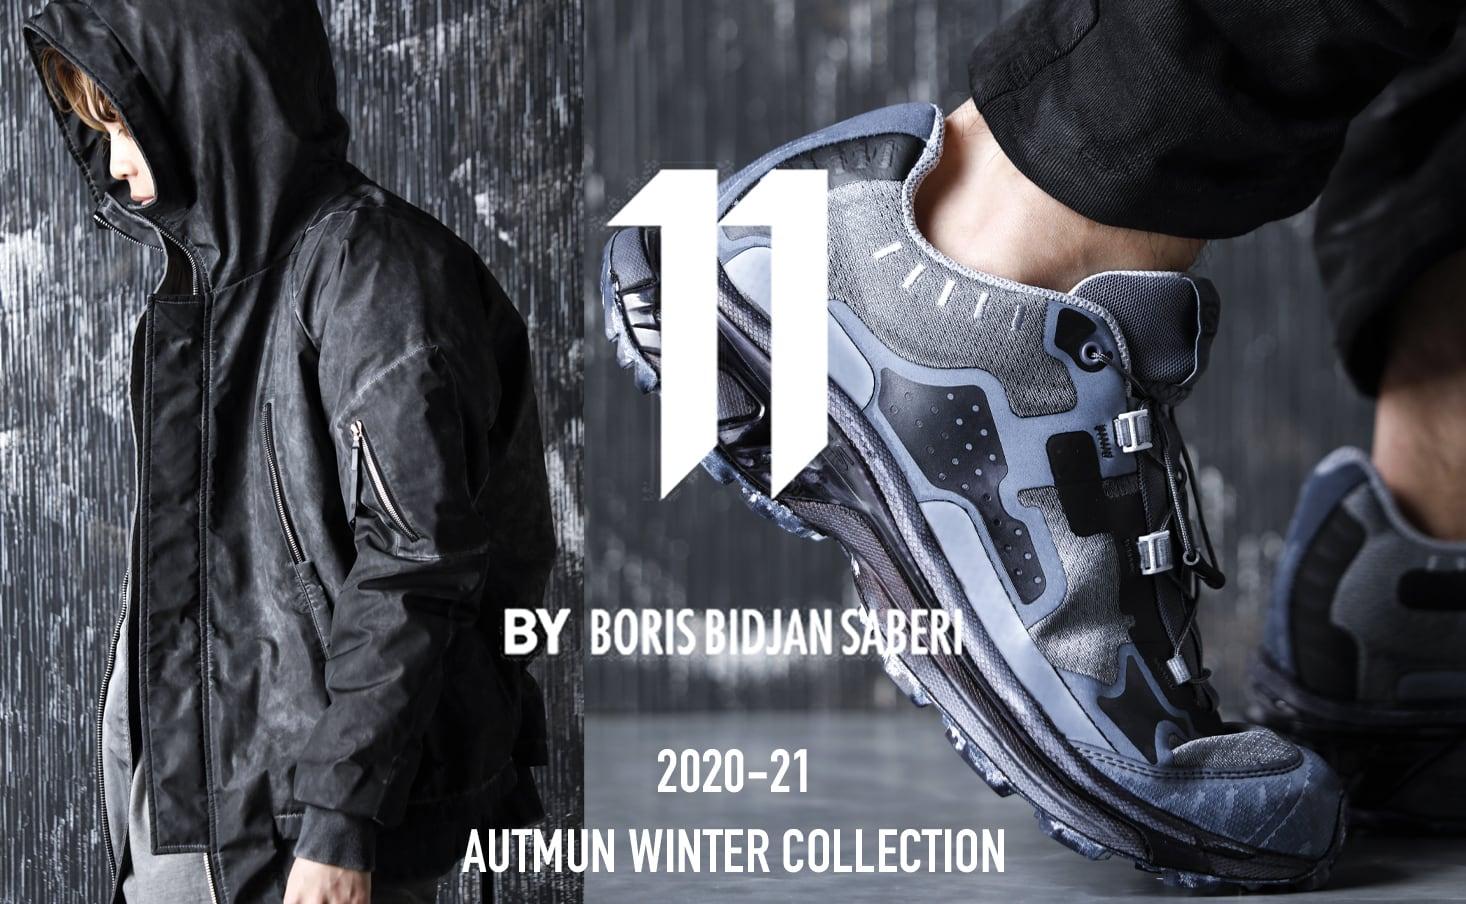 11 by Boris Bidjan Saberi 2020-21AW collection